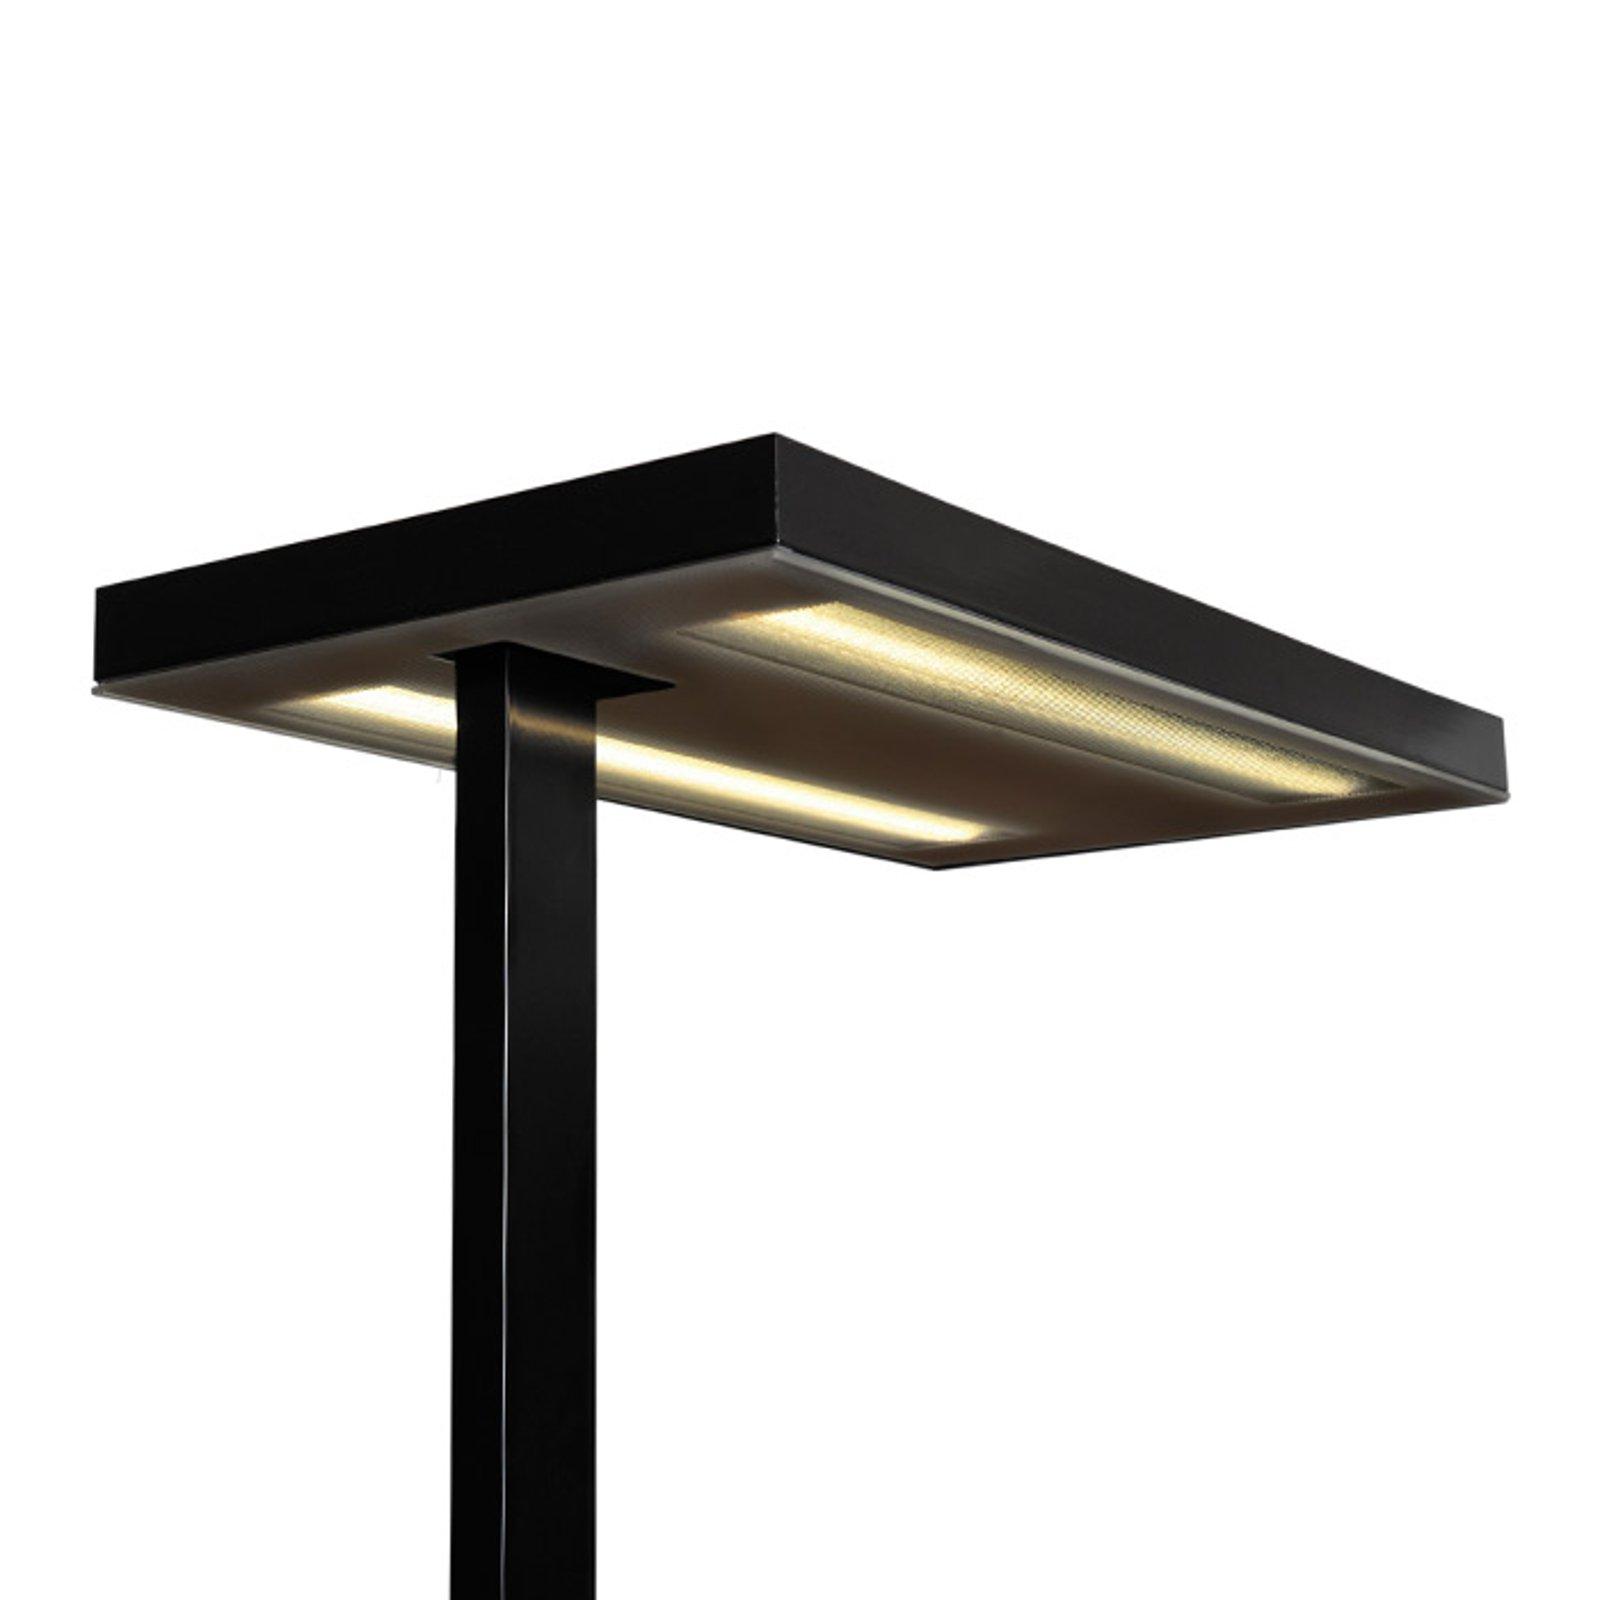 Kontorlampe gulv Free-F LED 10000 HF 840 CP2 svart